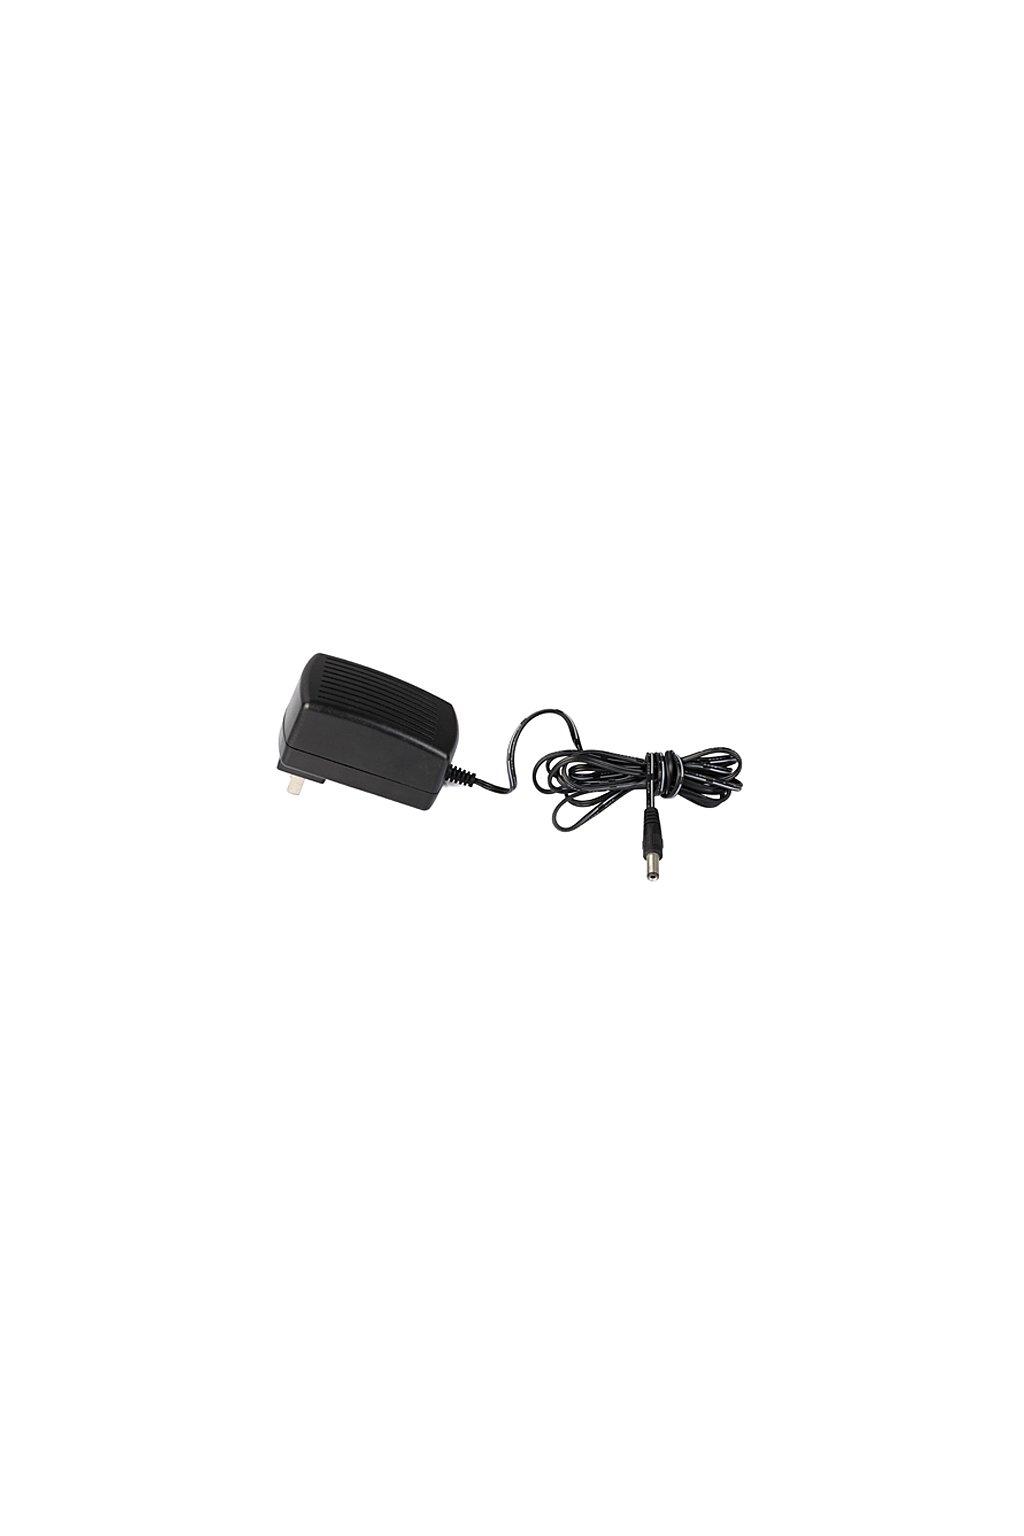 Duoro ULTIMATE hálózati adapter